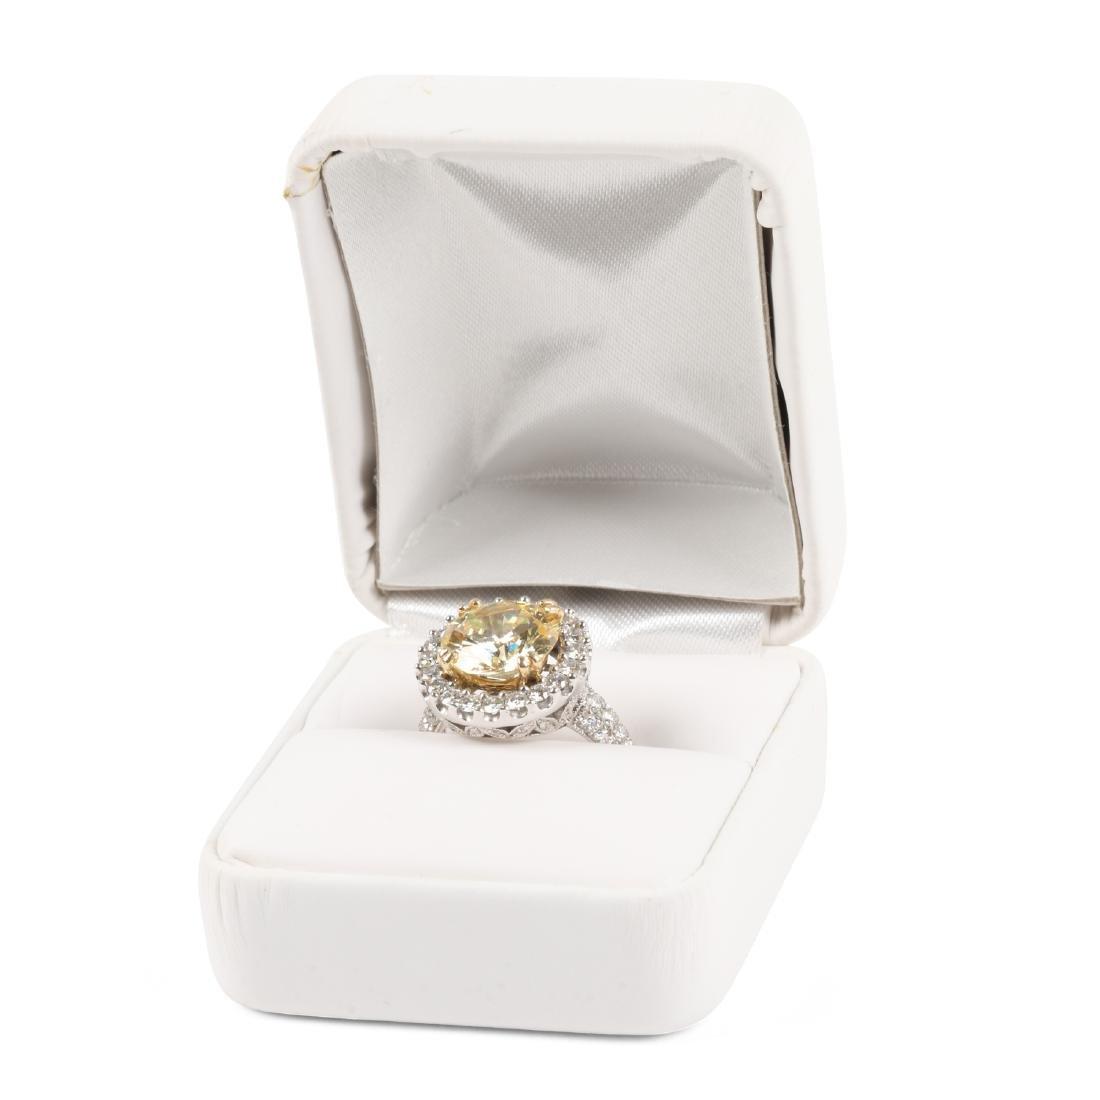 An 18K Gold, Diamond & Cubic Zirconia Ring